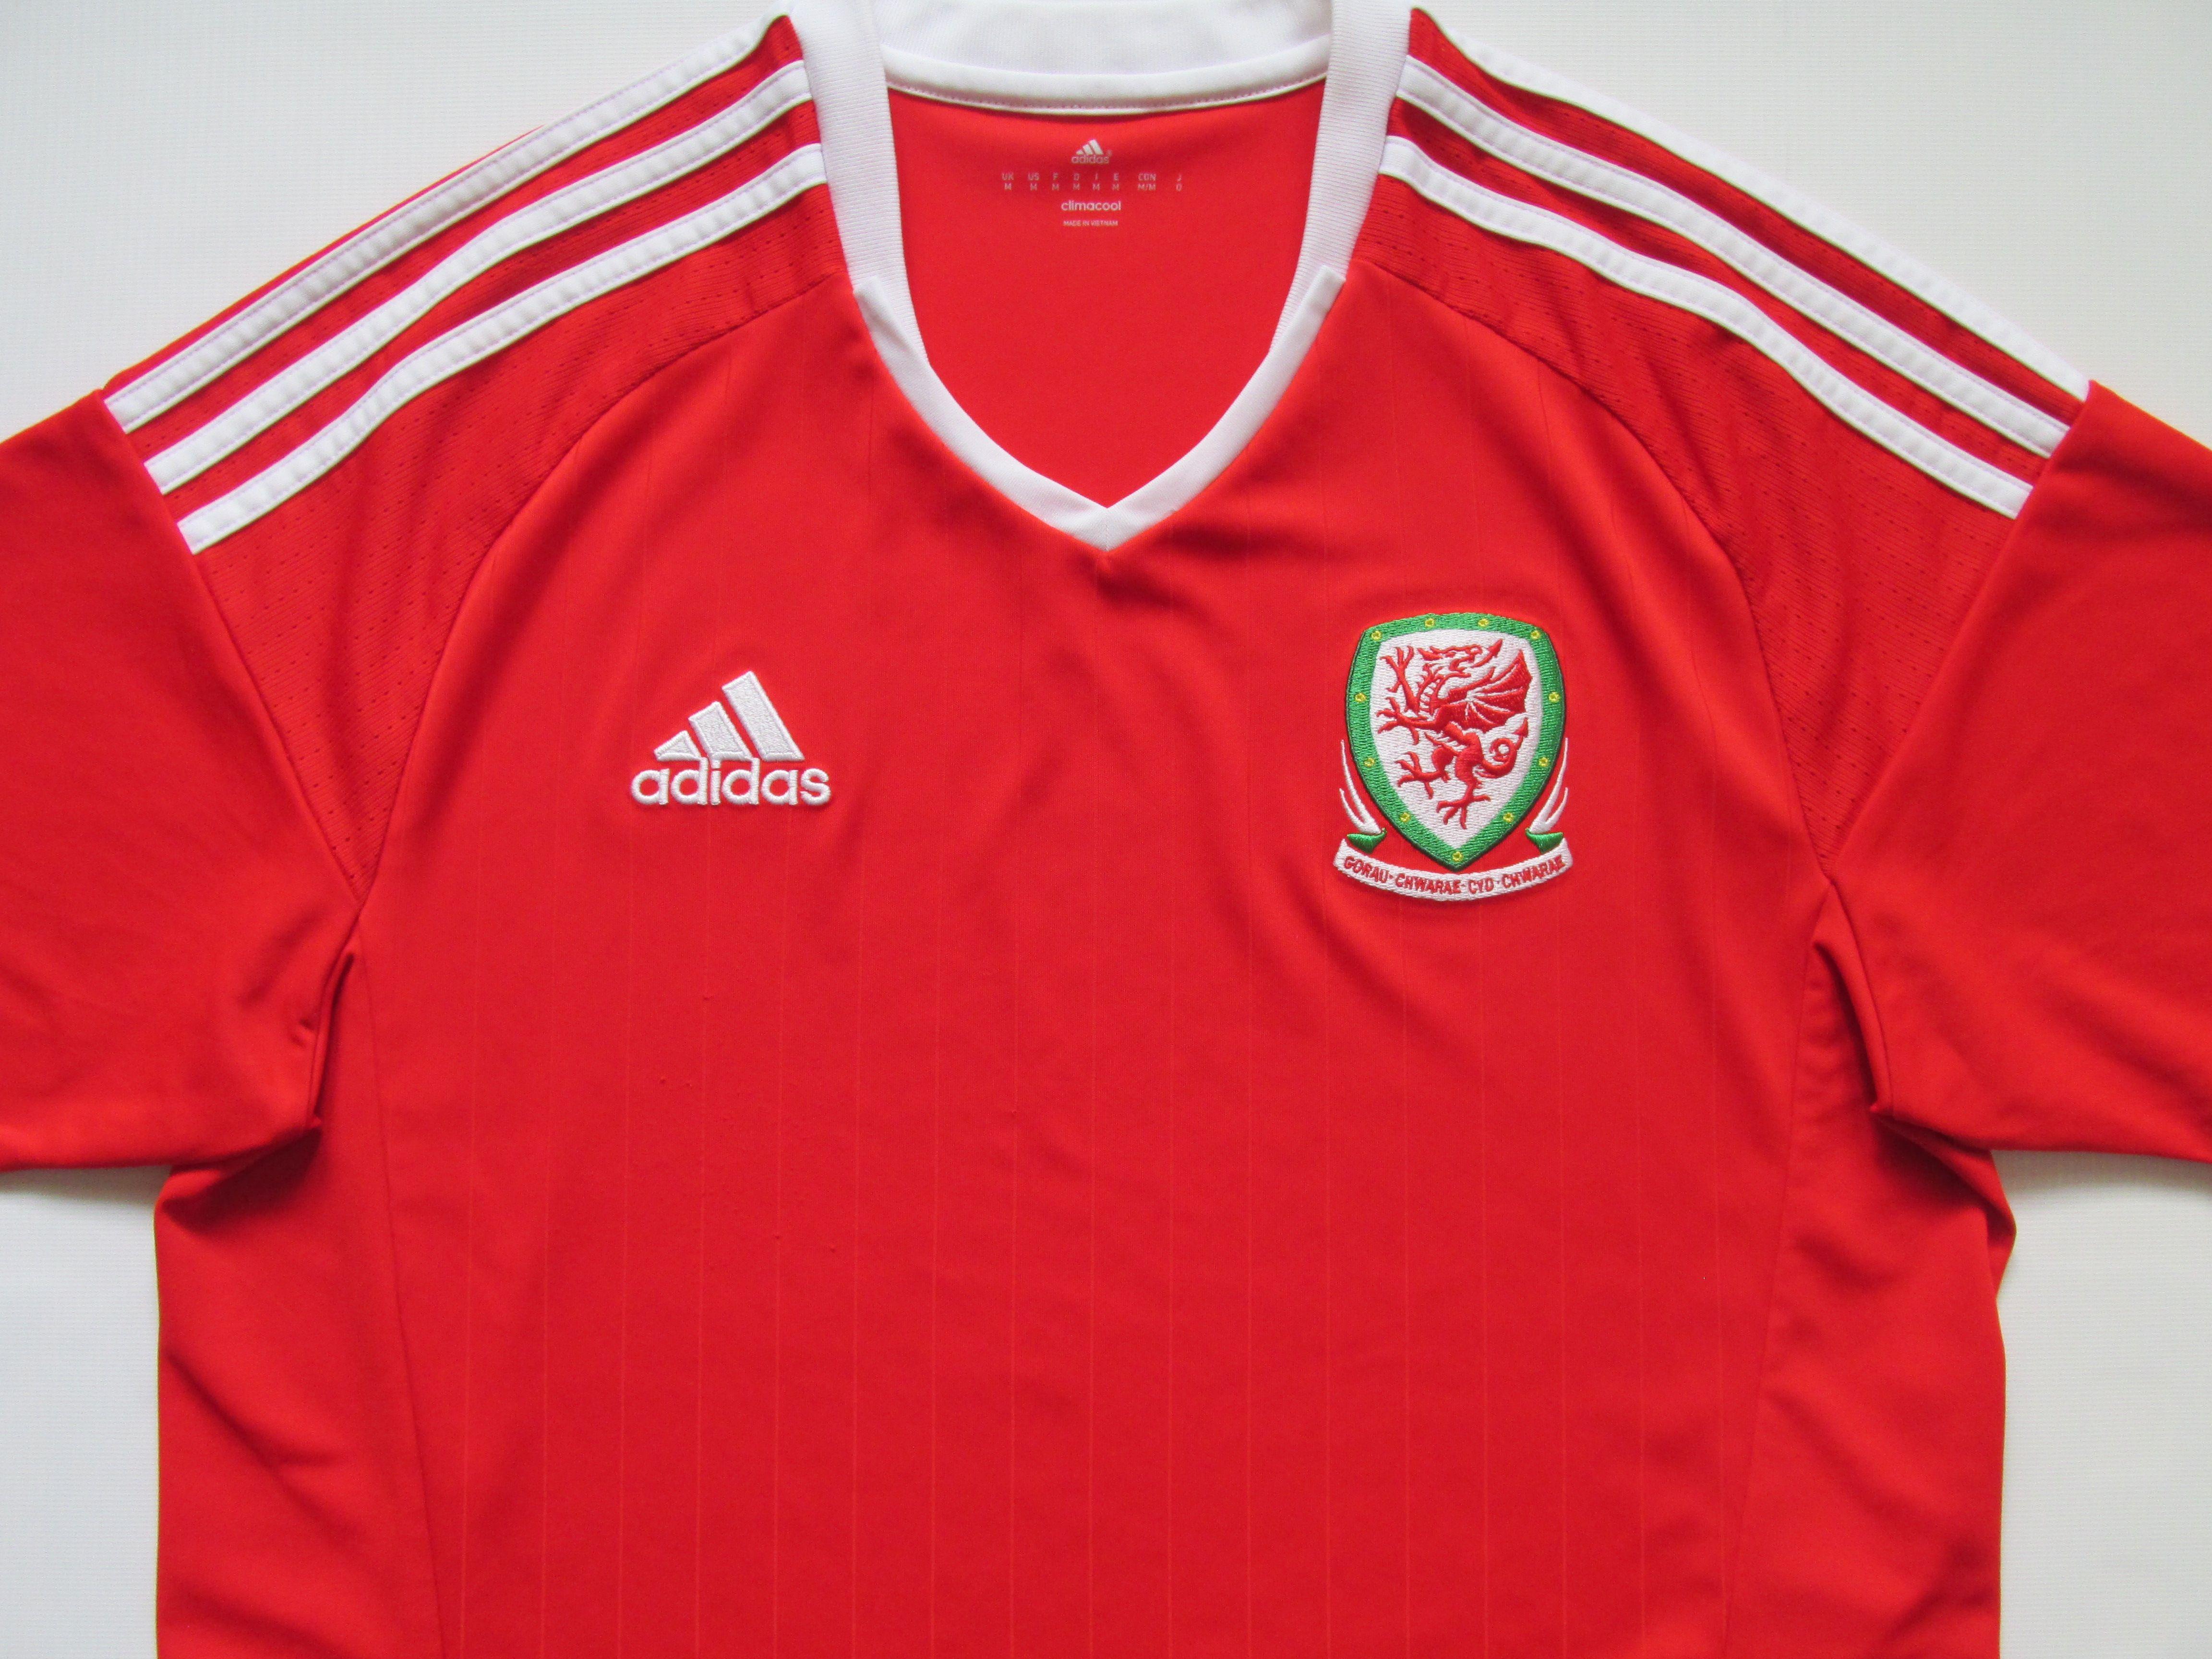 brand new 8e40c e4657 Wales 2015/2016 home football shirt by Adidas NT Euro2016 ...